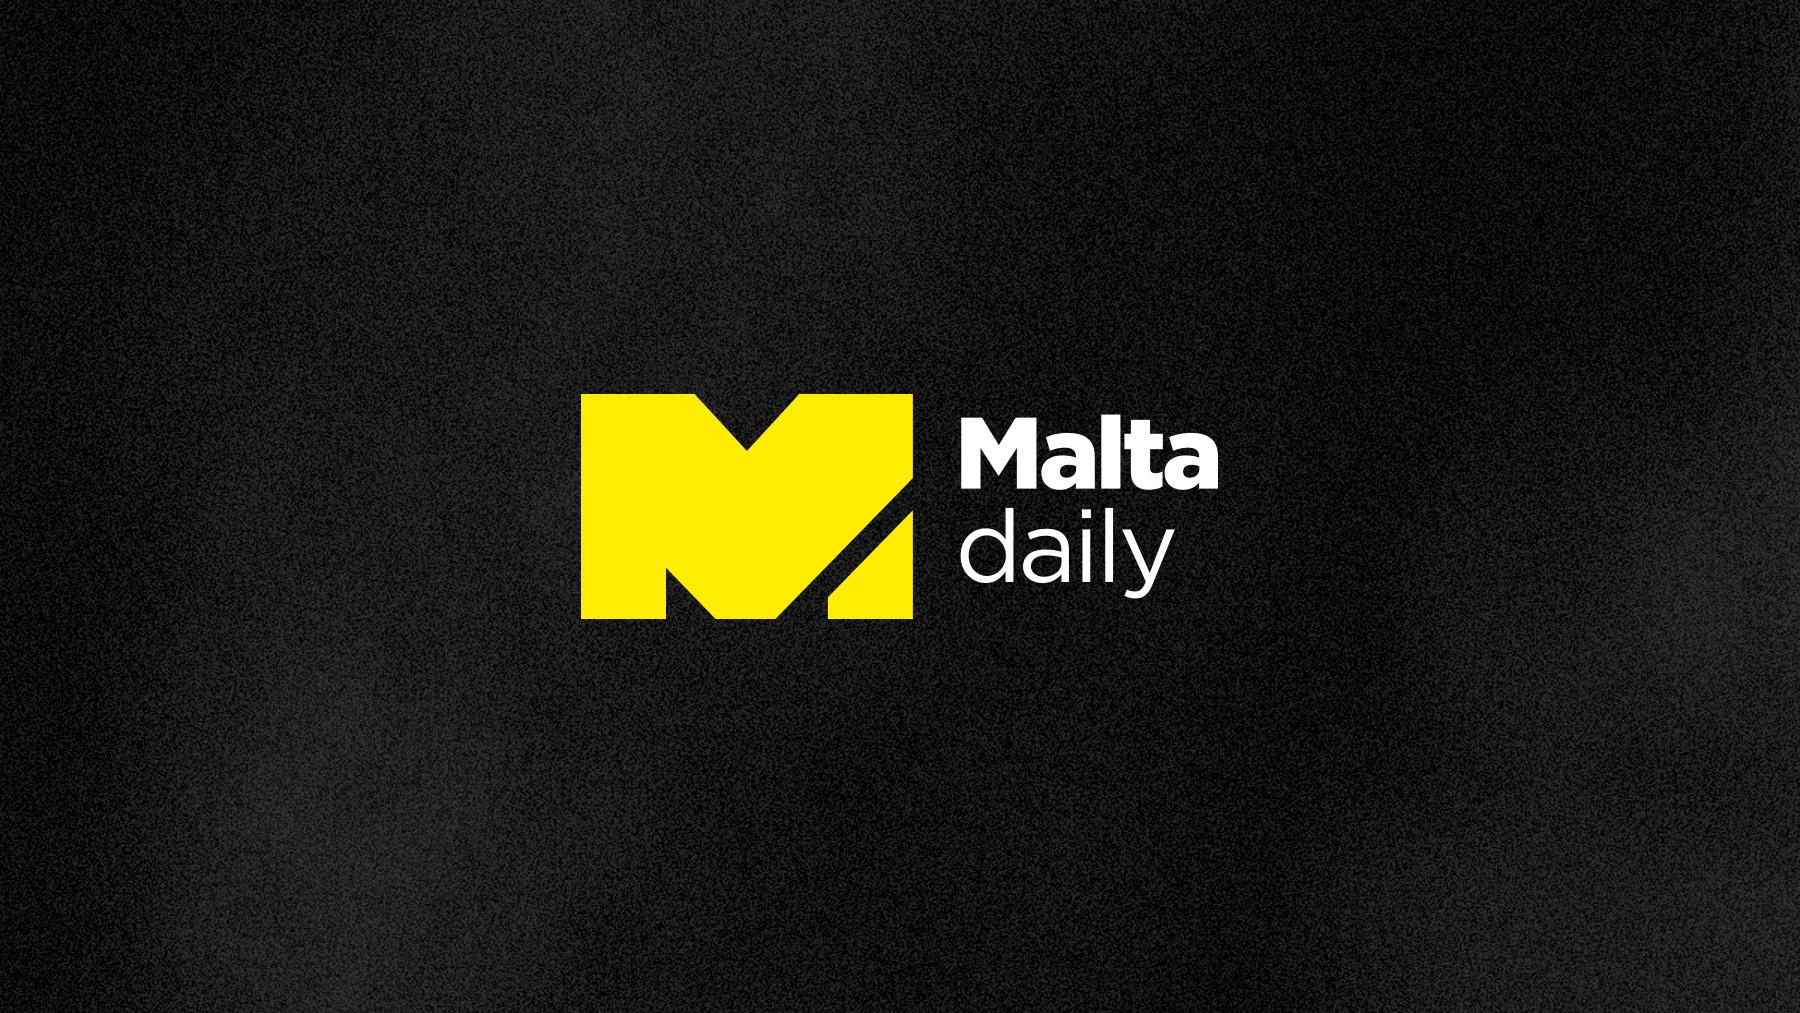 01 Maltadaily